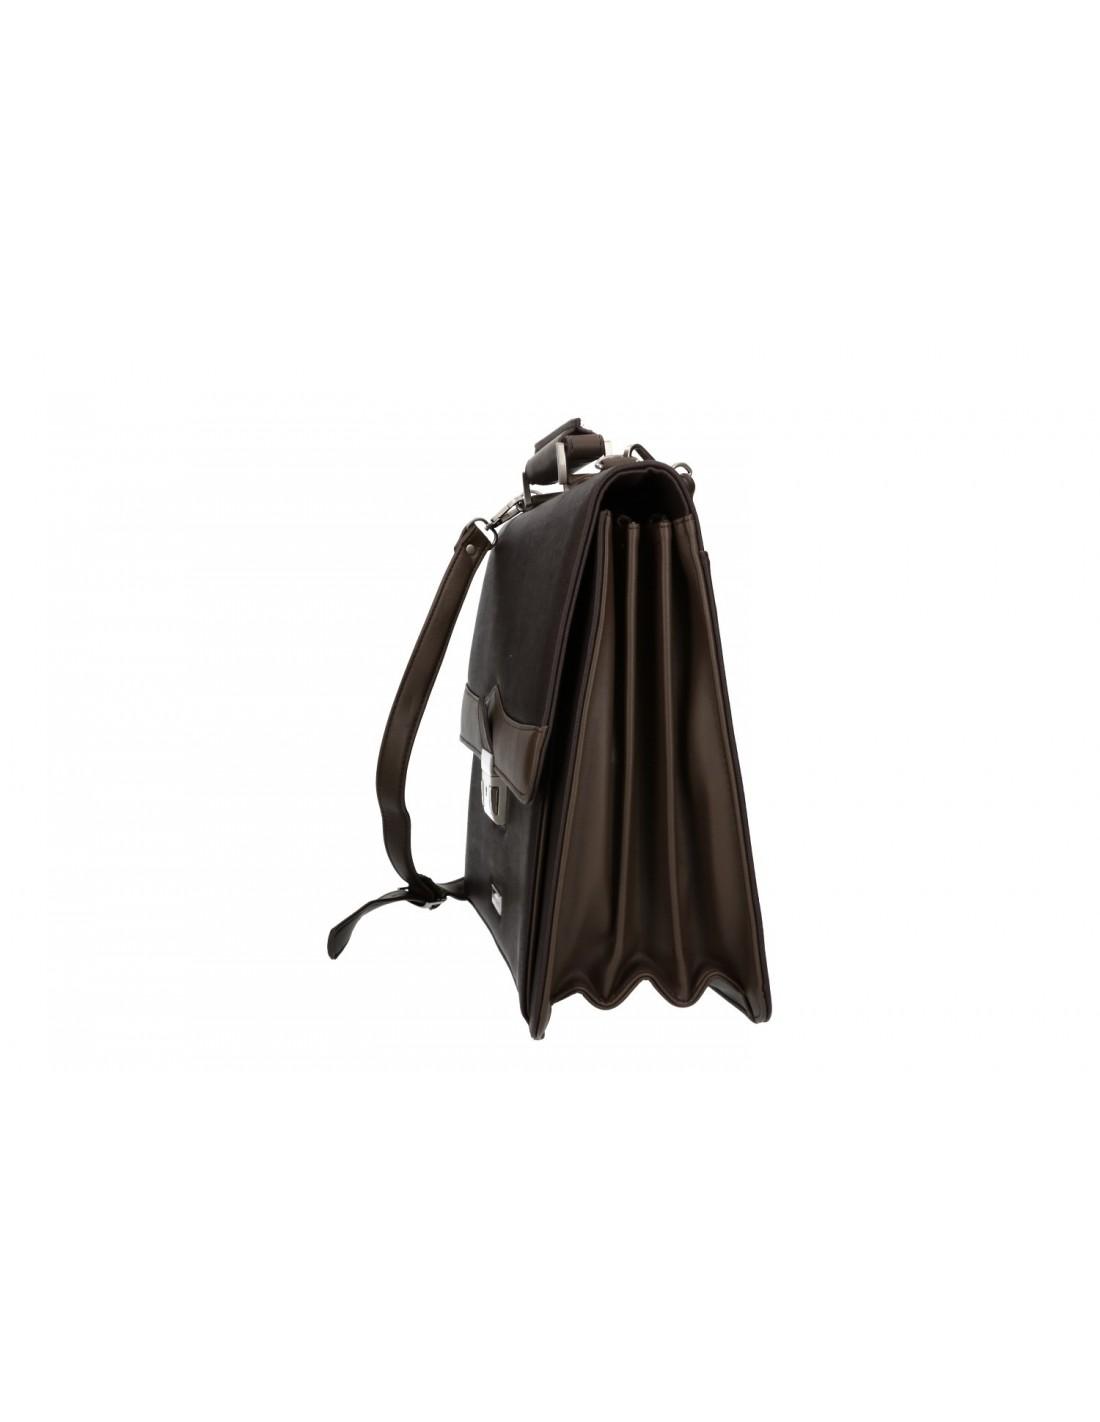 d2d8930d18 Cartella professionale PIERRE CARDIN borsa ufficio portadocumenti  3/10316_INN01